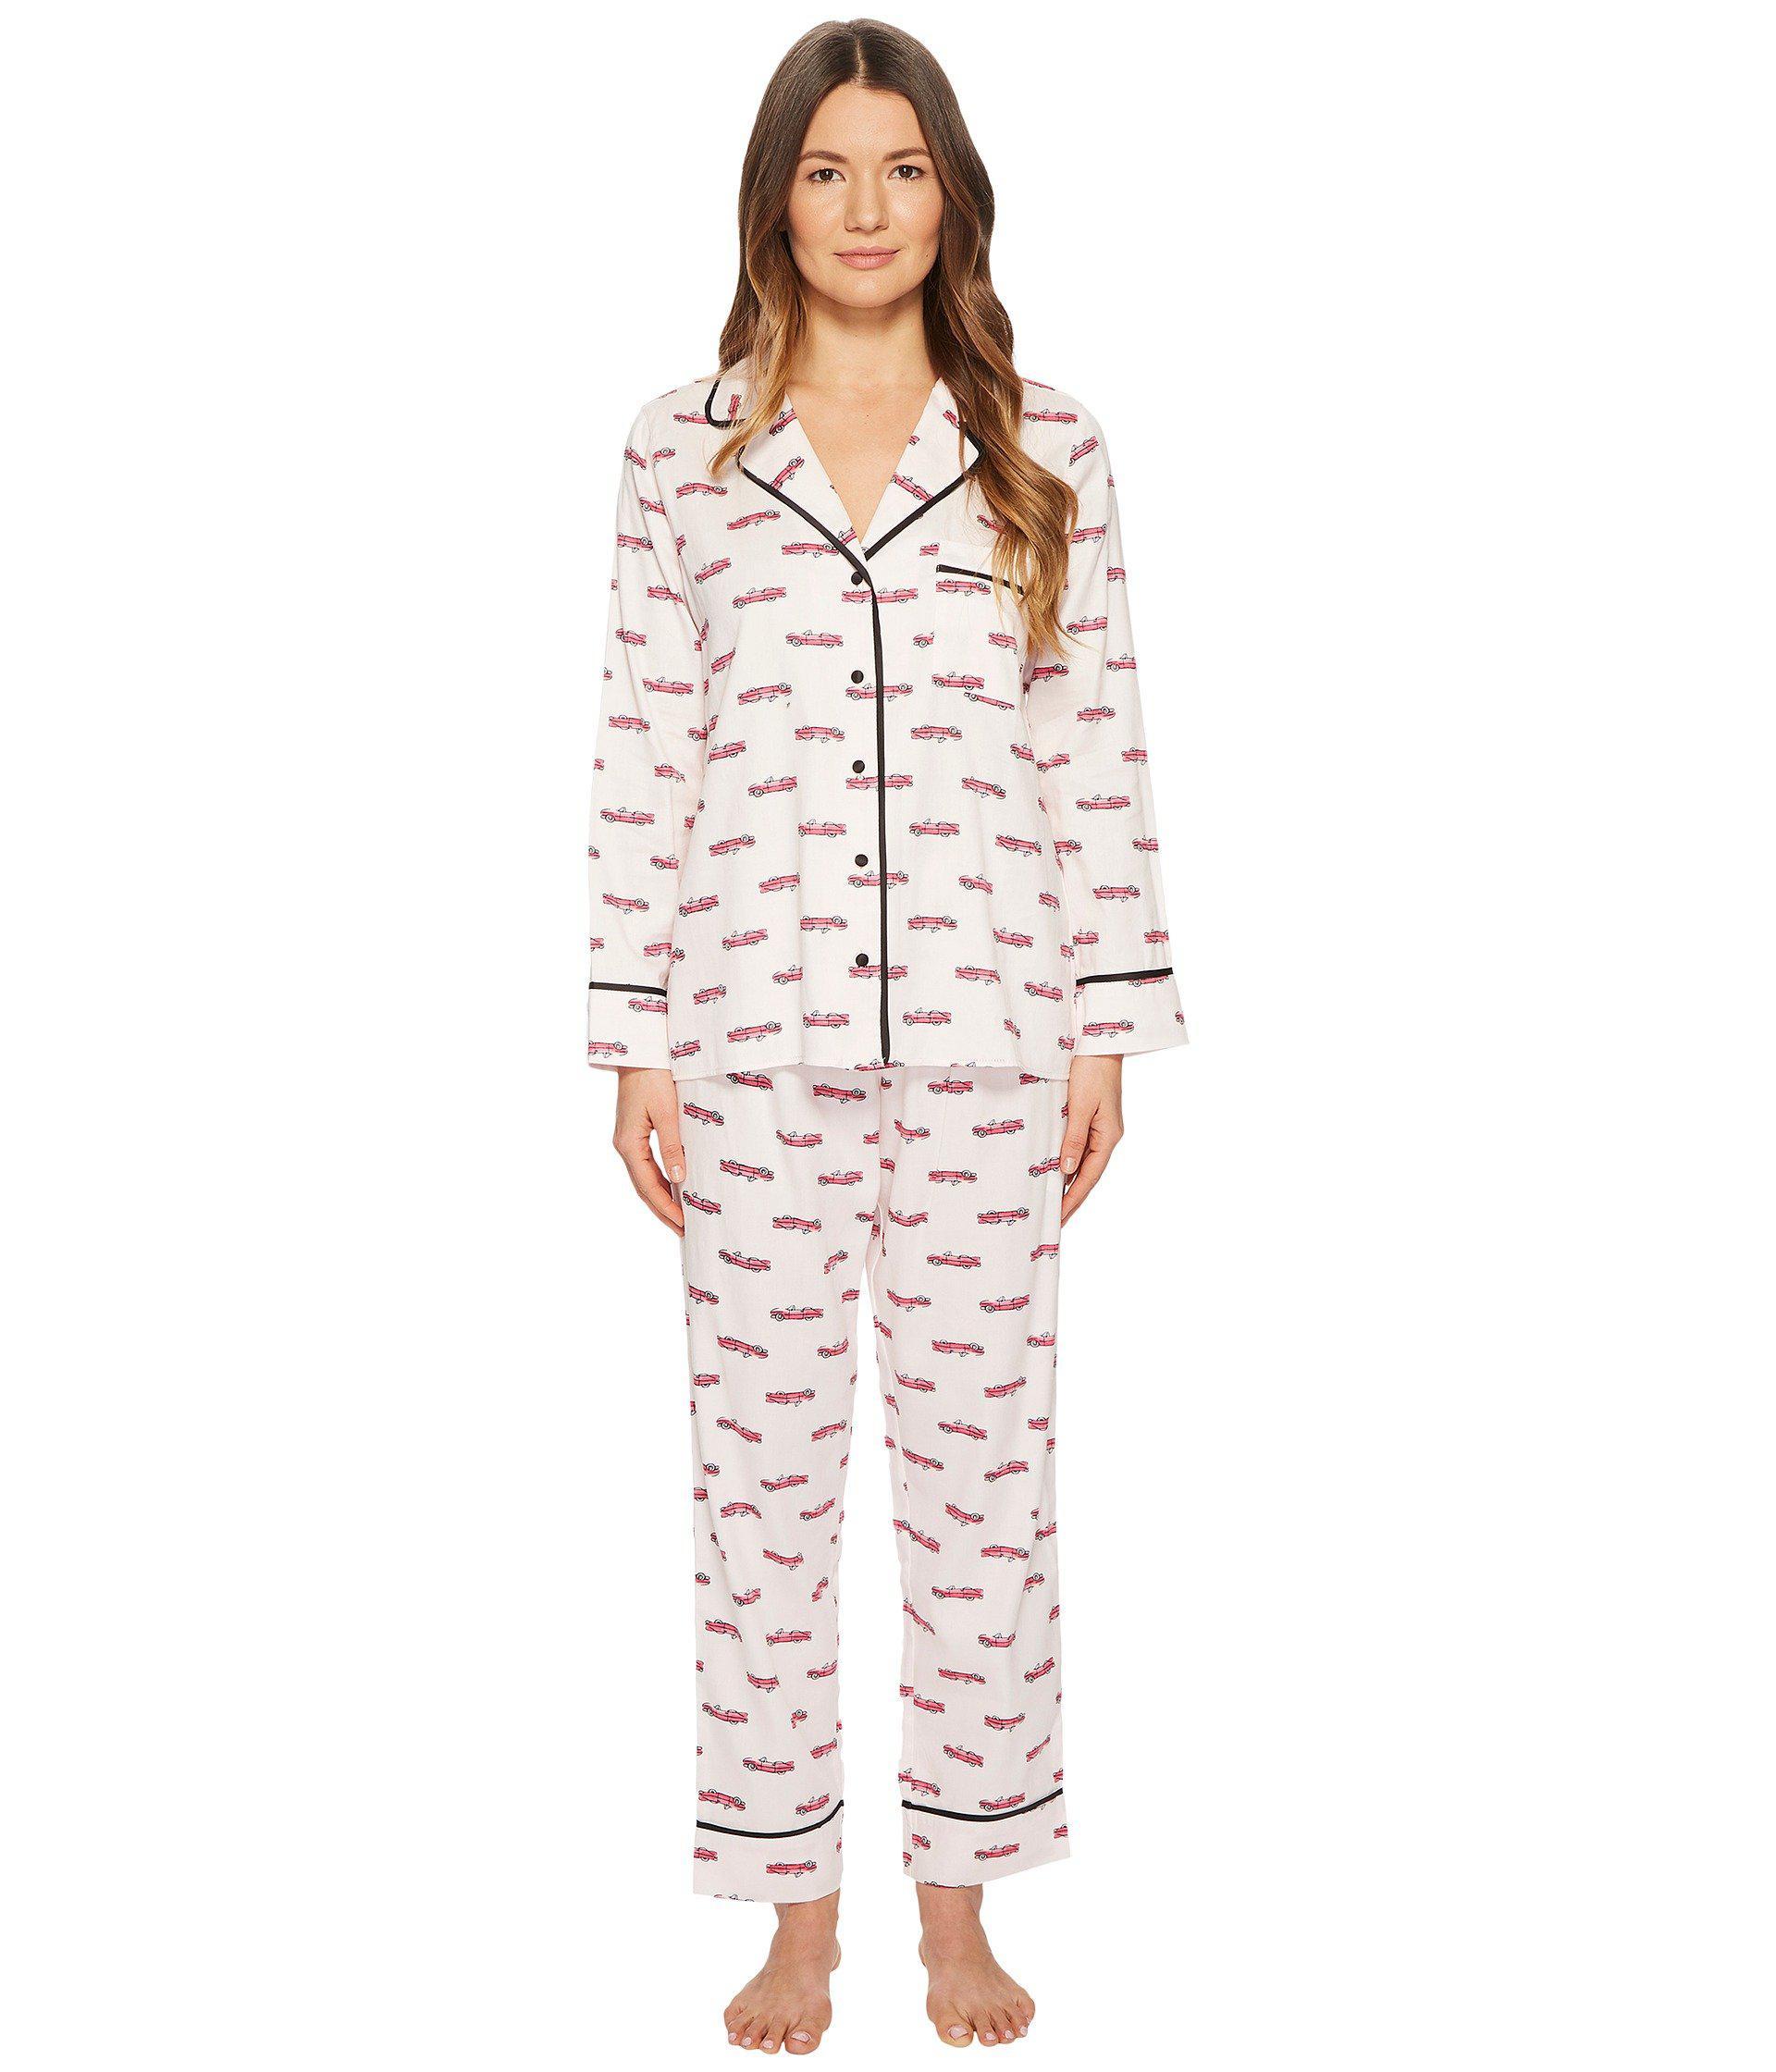 Lyst - Kate Spade Hot Rod Pajama Set